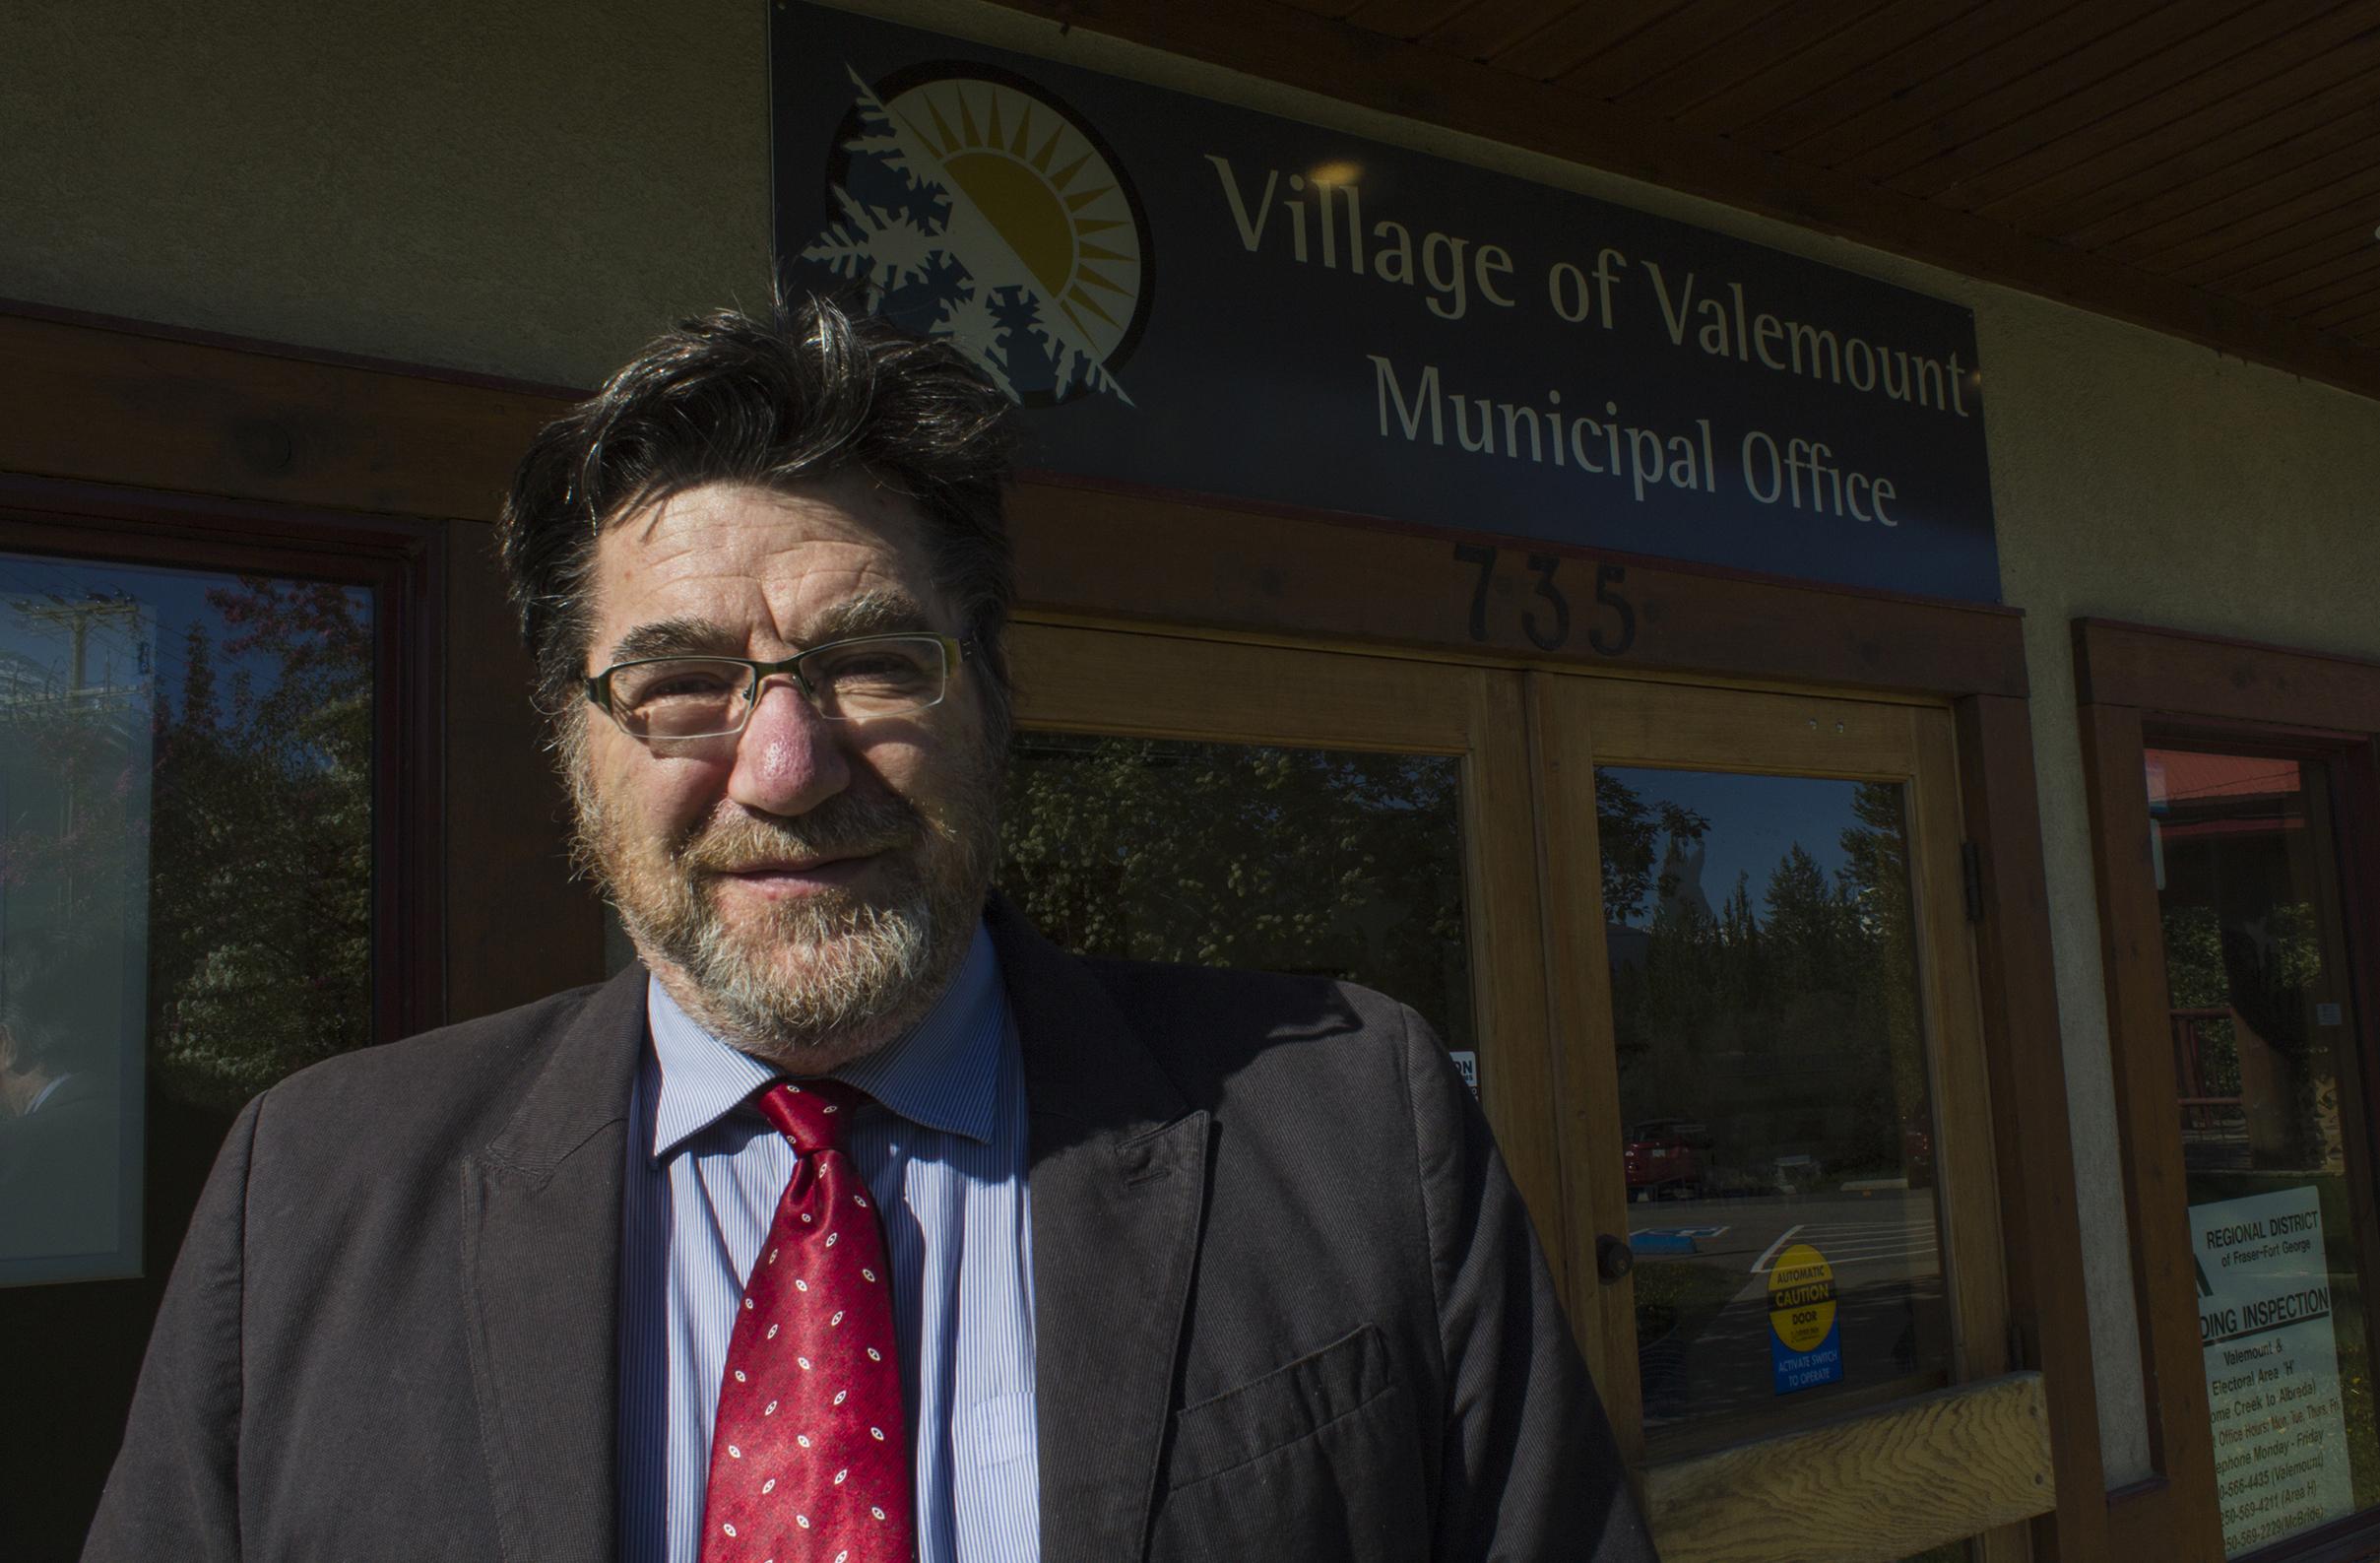 Mark Brennan is the new corporate officer for the Village of Valemount. / EVAN MATTHEWS